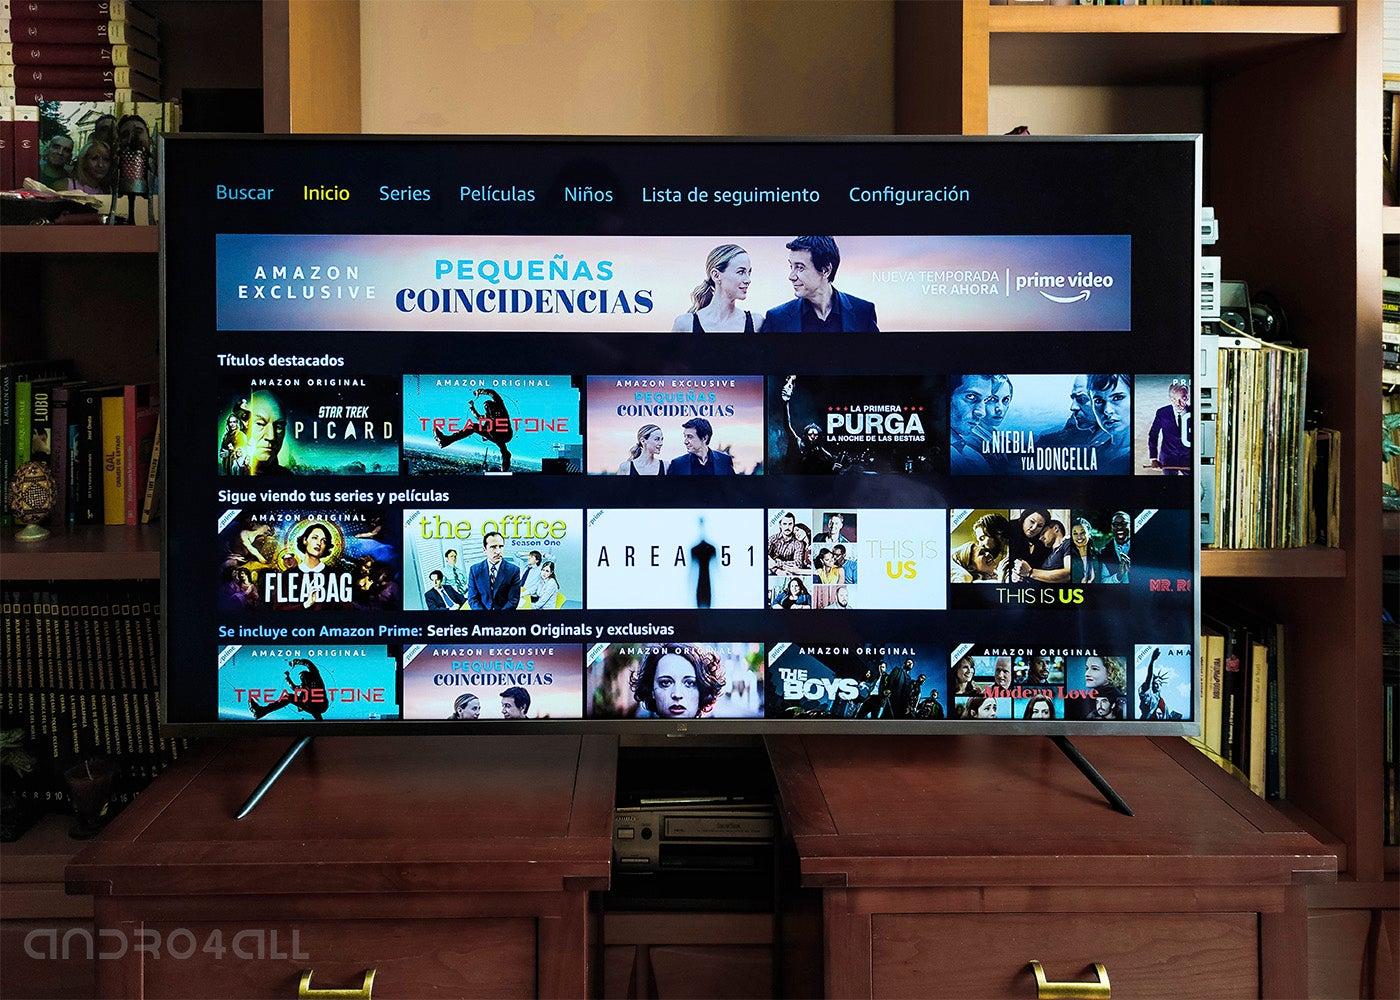 Премиерот Видео на Xiaomi Mi TV